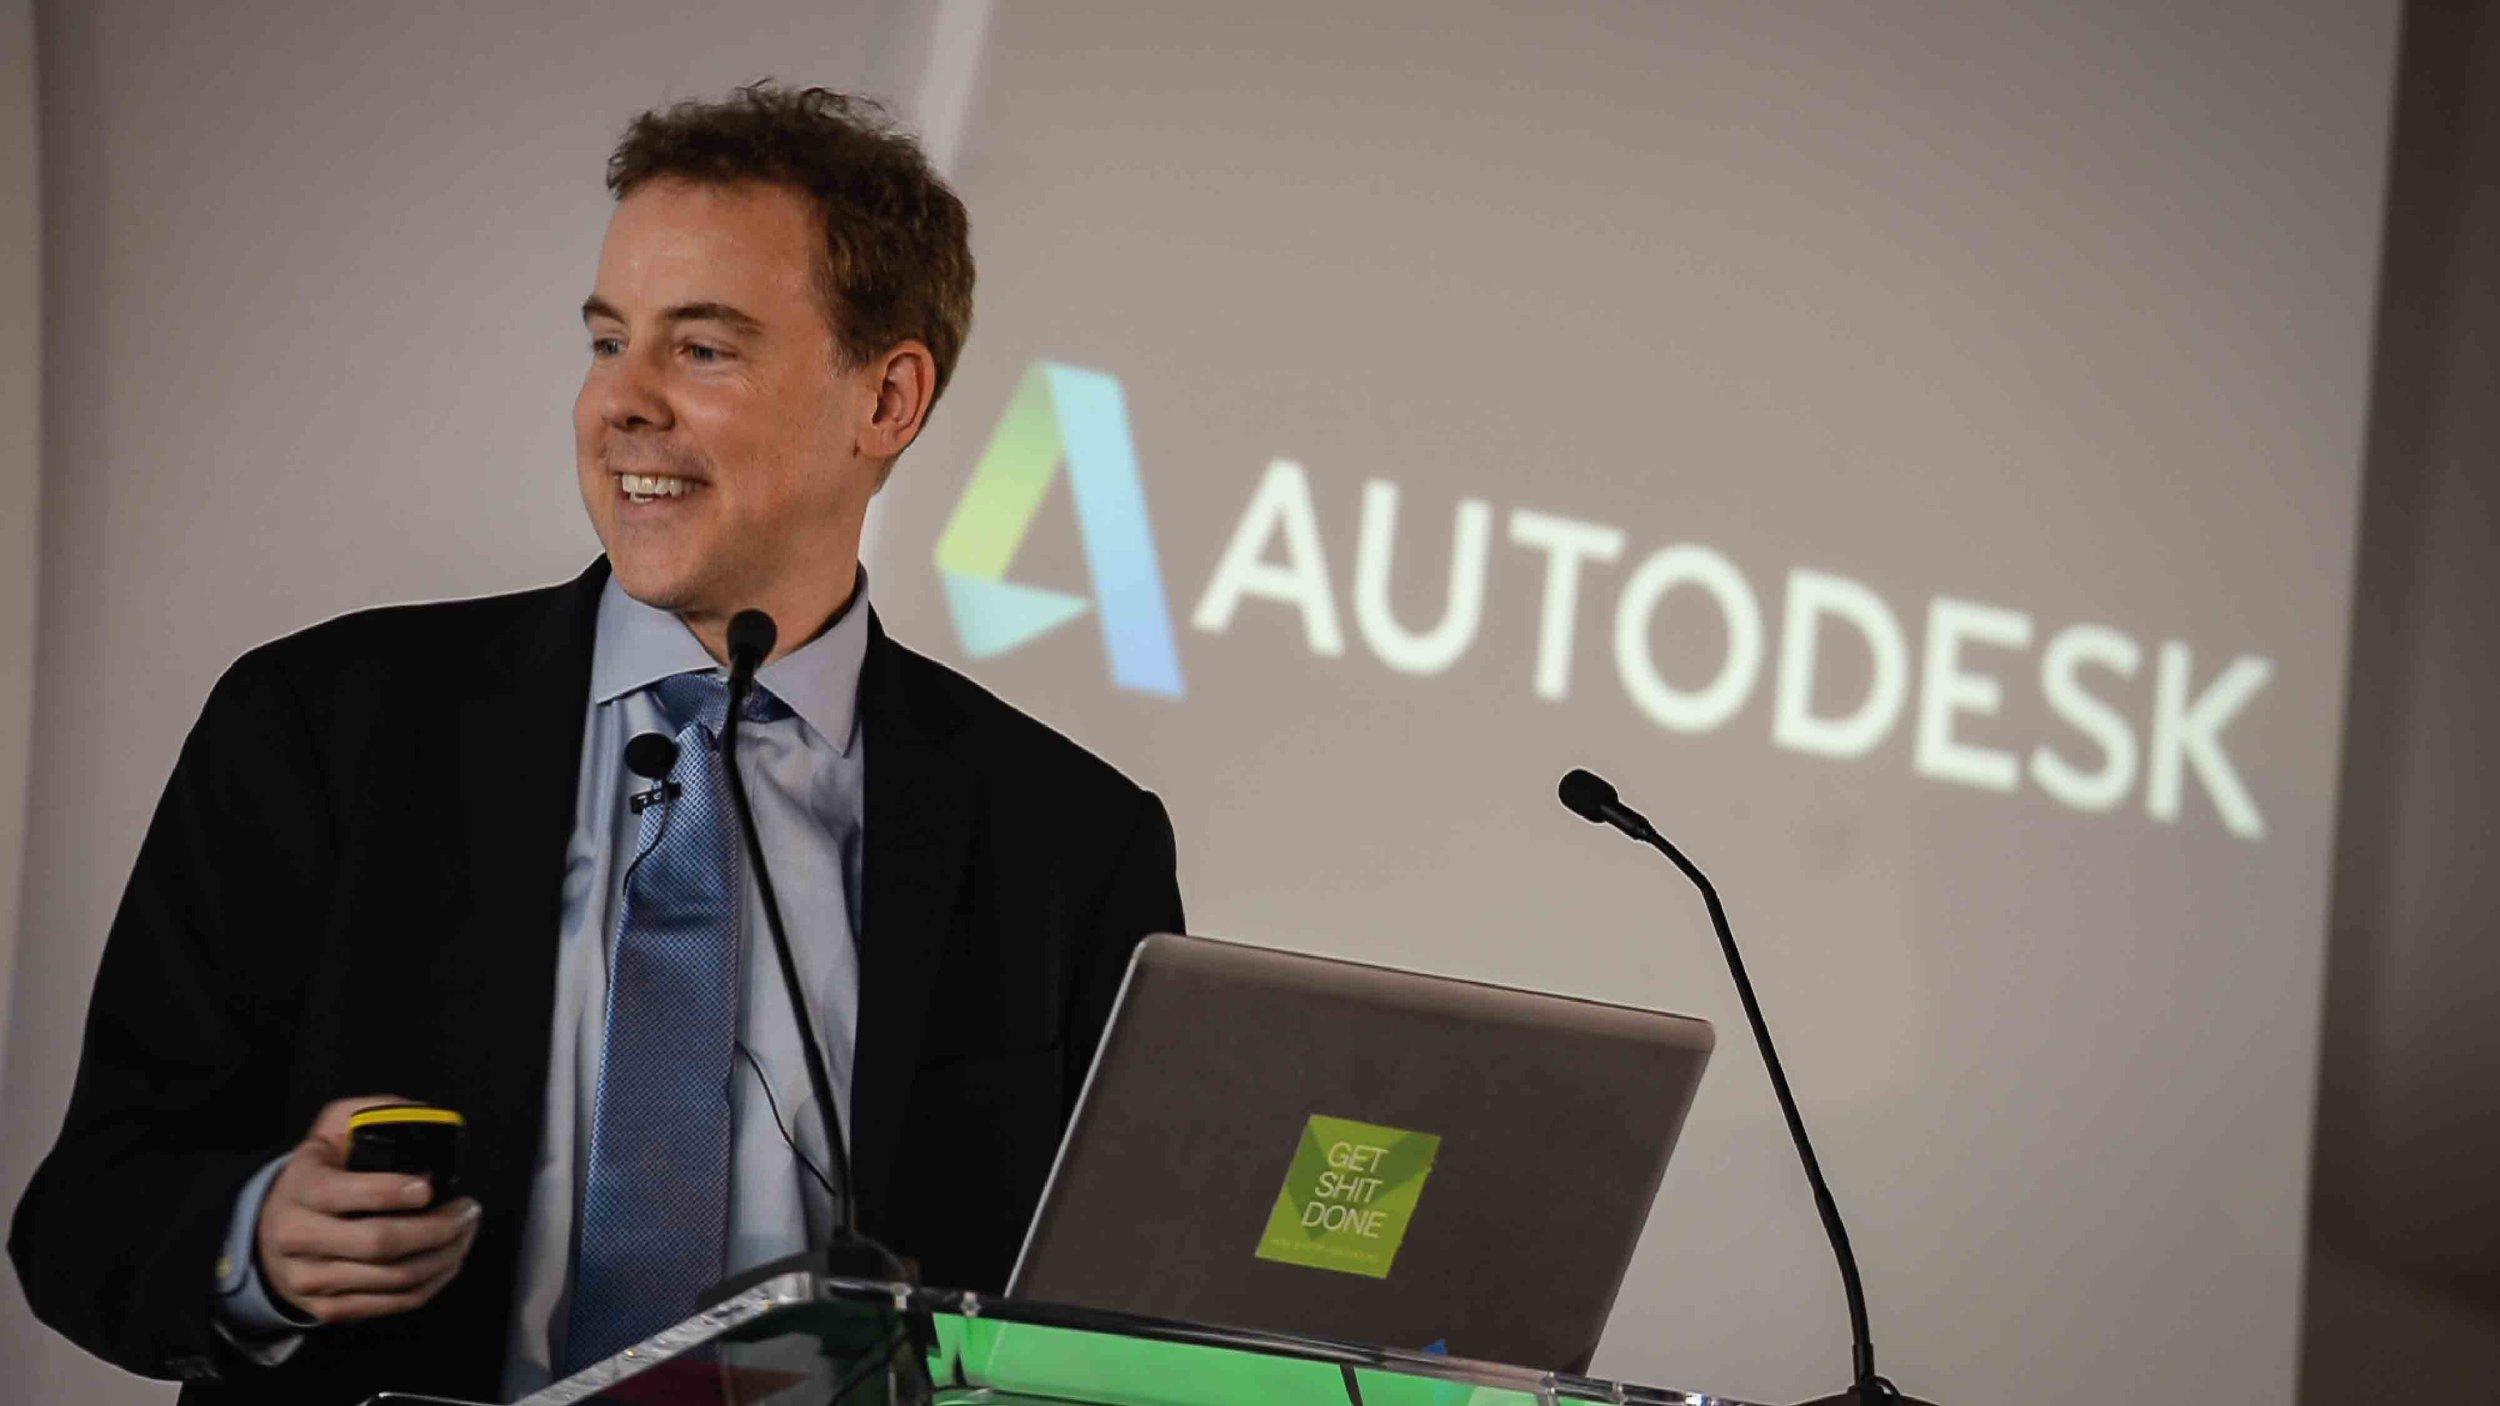 Autodesk Construction Event UK 2016-24.jpg